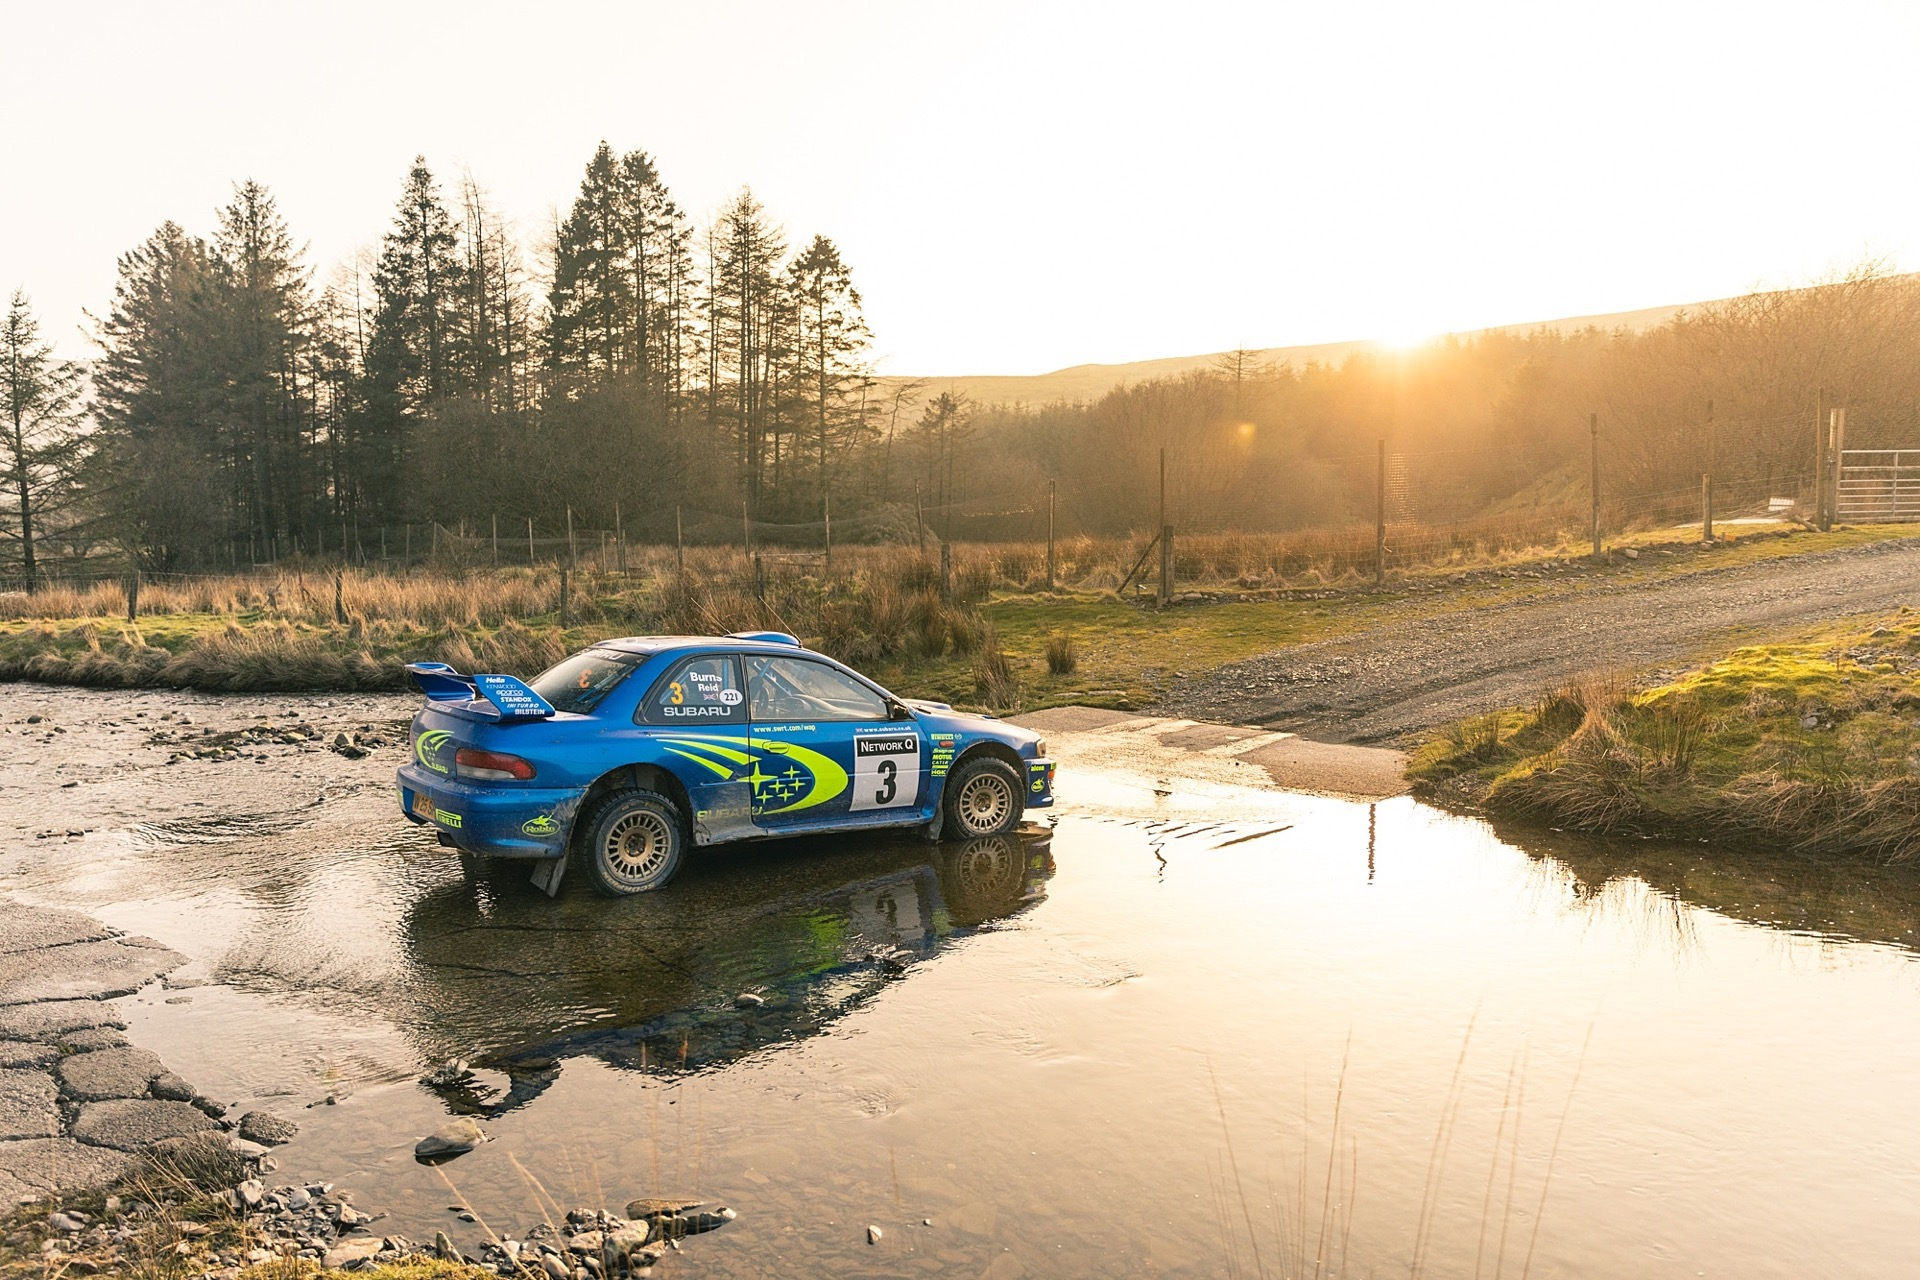 Richard_Burns_Subaru_Impreza_WRC_sale-0013